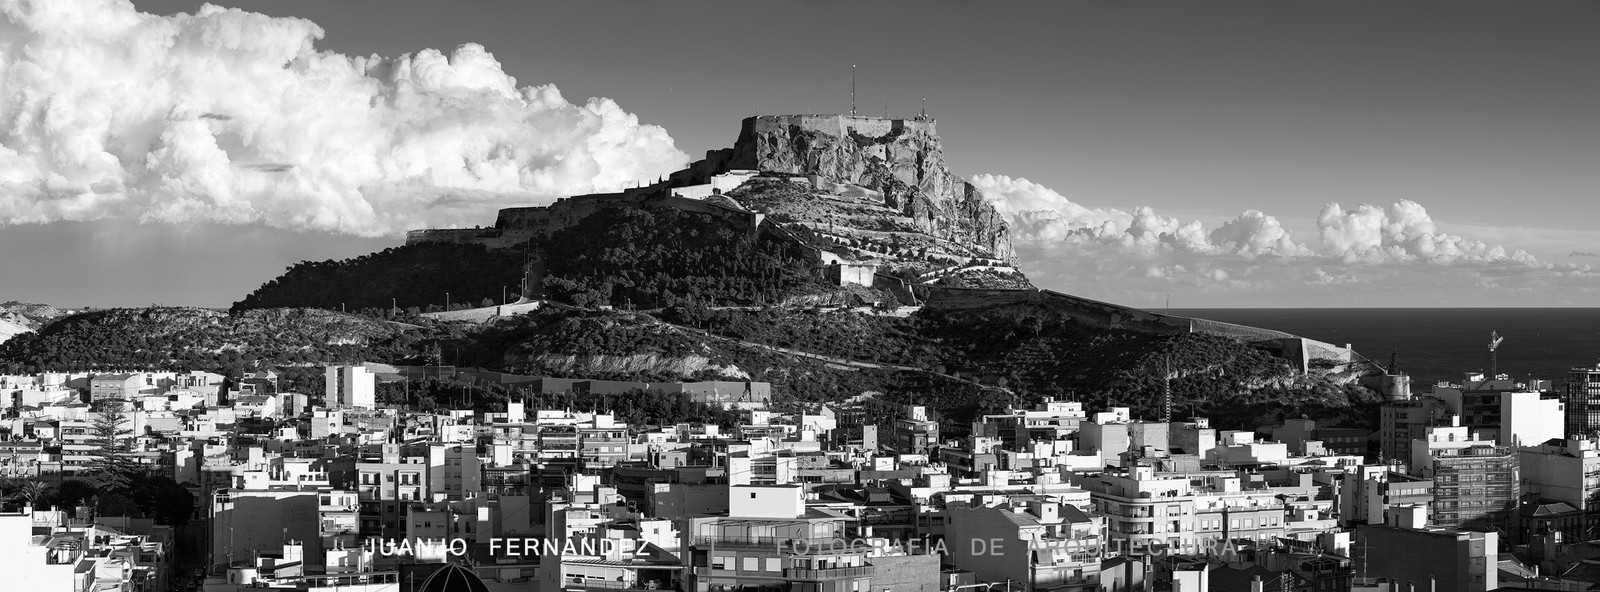 1422362759_Desde-Castillo-San-Fernando-nube